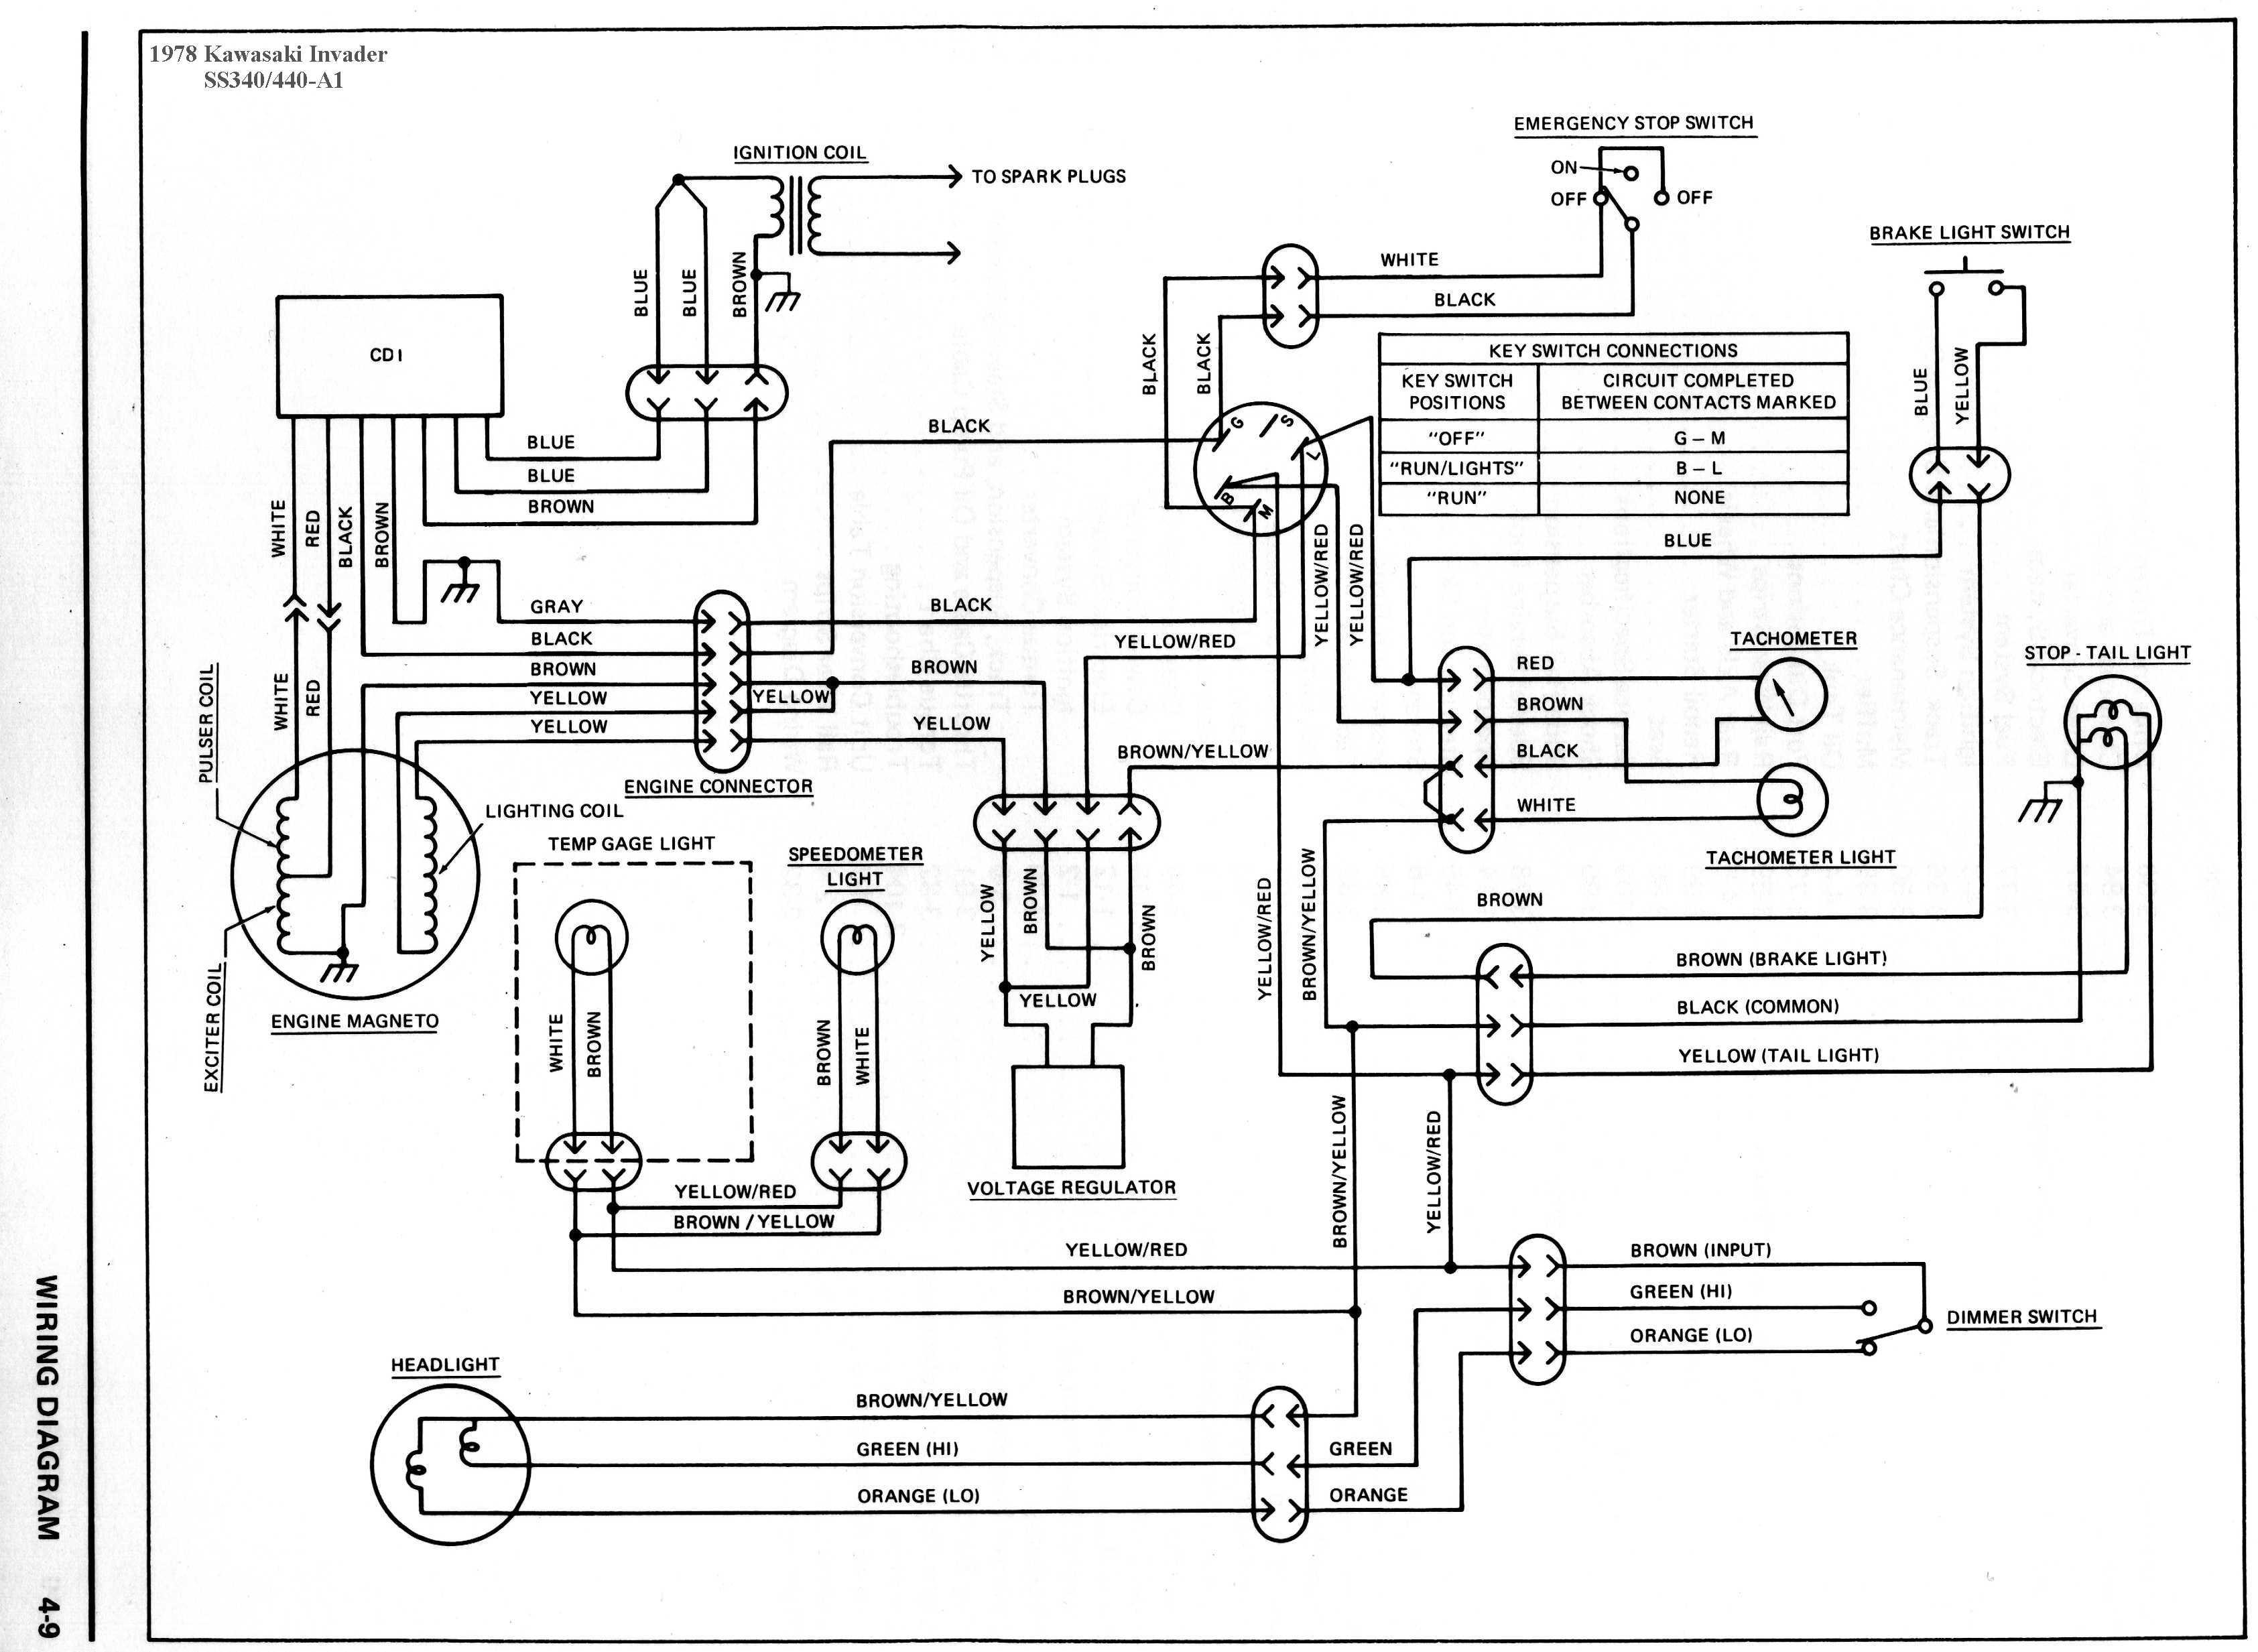 [DIAGRAM_4PO]  DK_5673] Kawasaki Bayou 220 Wiring Diagram In Addition Wiring Diagram 1999  Free Diagram | Kawasaki Bayou 220 Wiring Harness |  | Expe Throp Atrix Tzici Dupl Hroni Xeira Mohammedshrine Librar Wiring 101